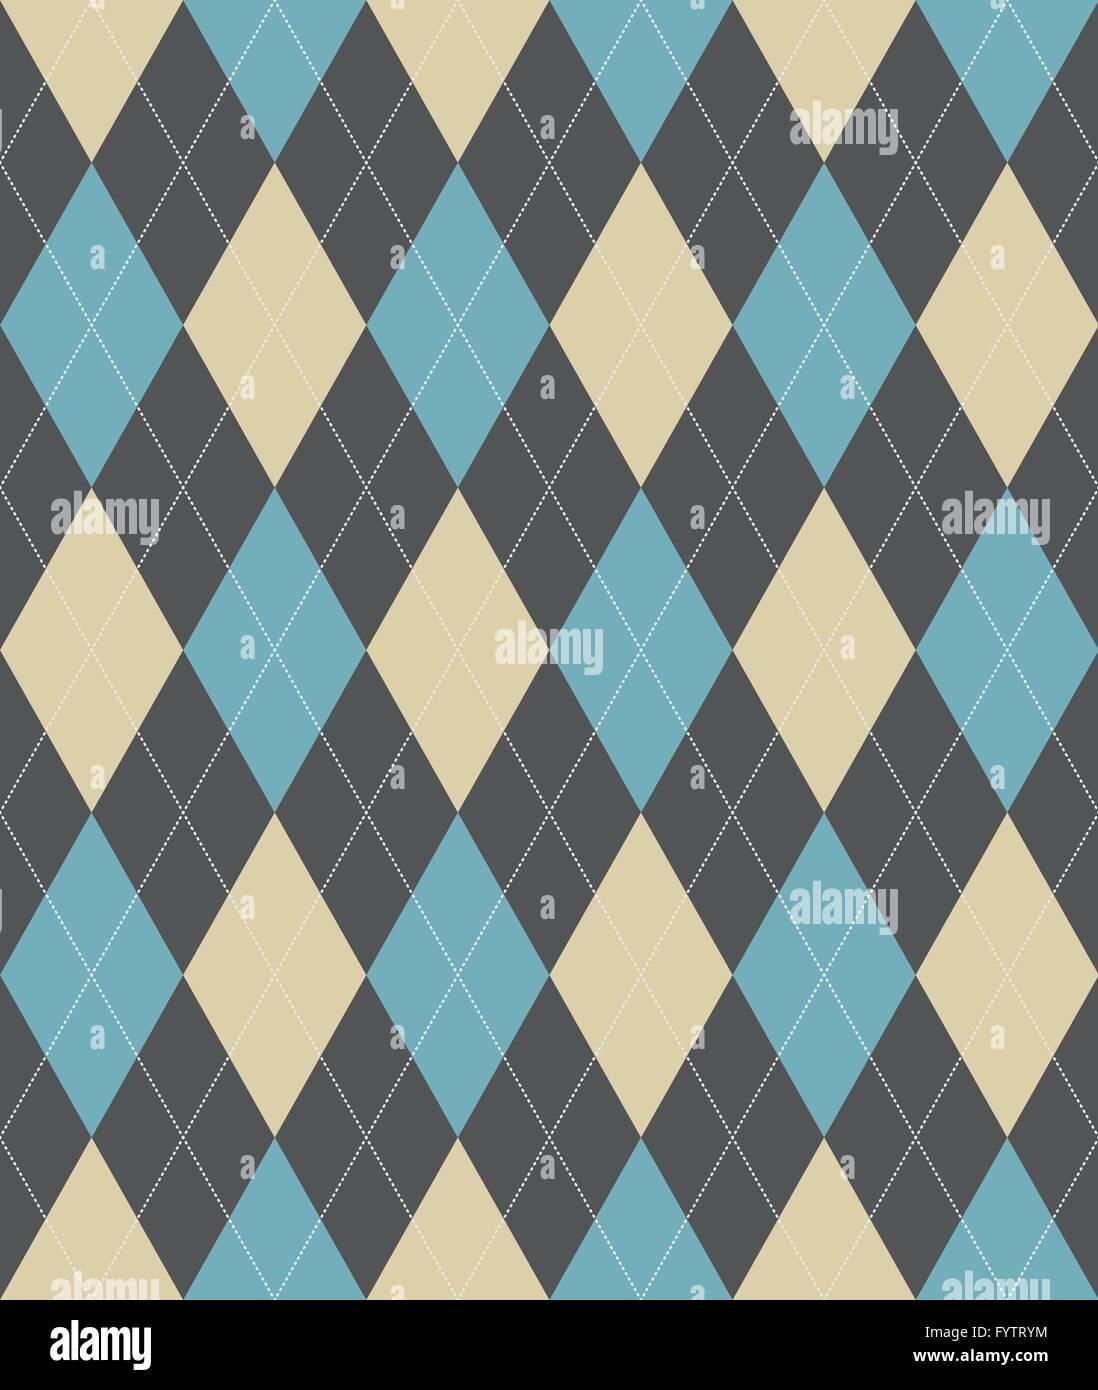 Pattern 018 - Stock Image